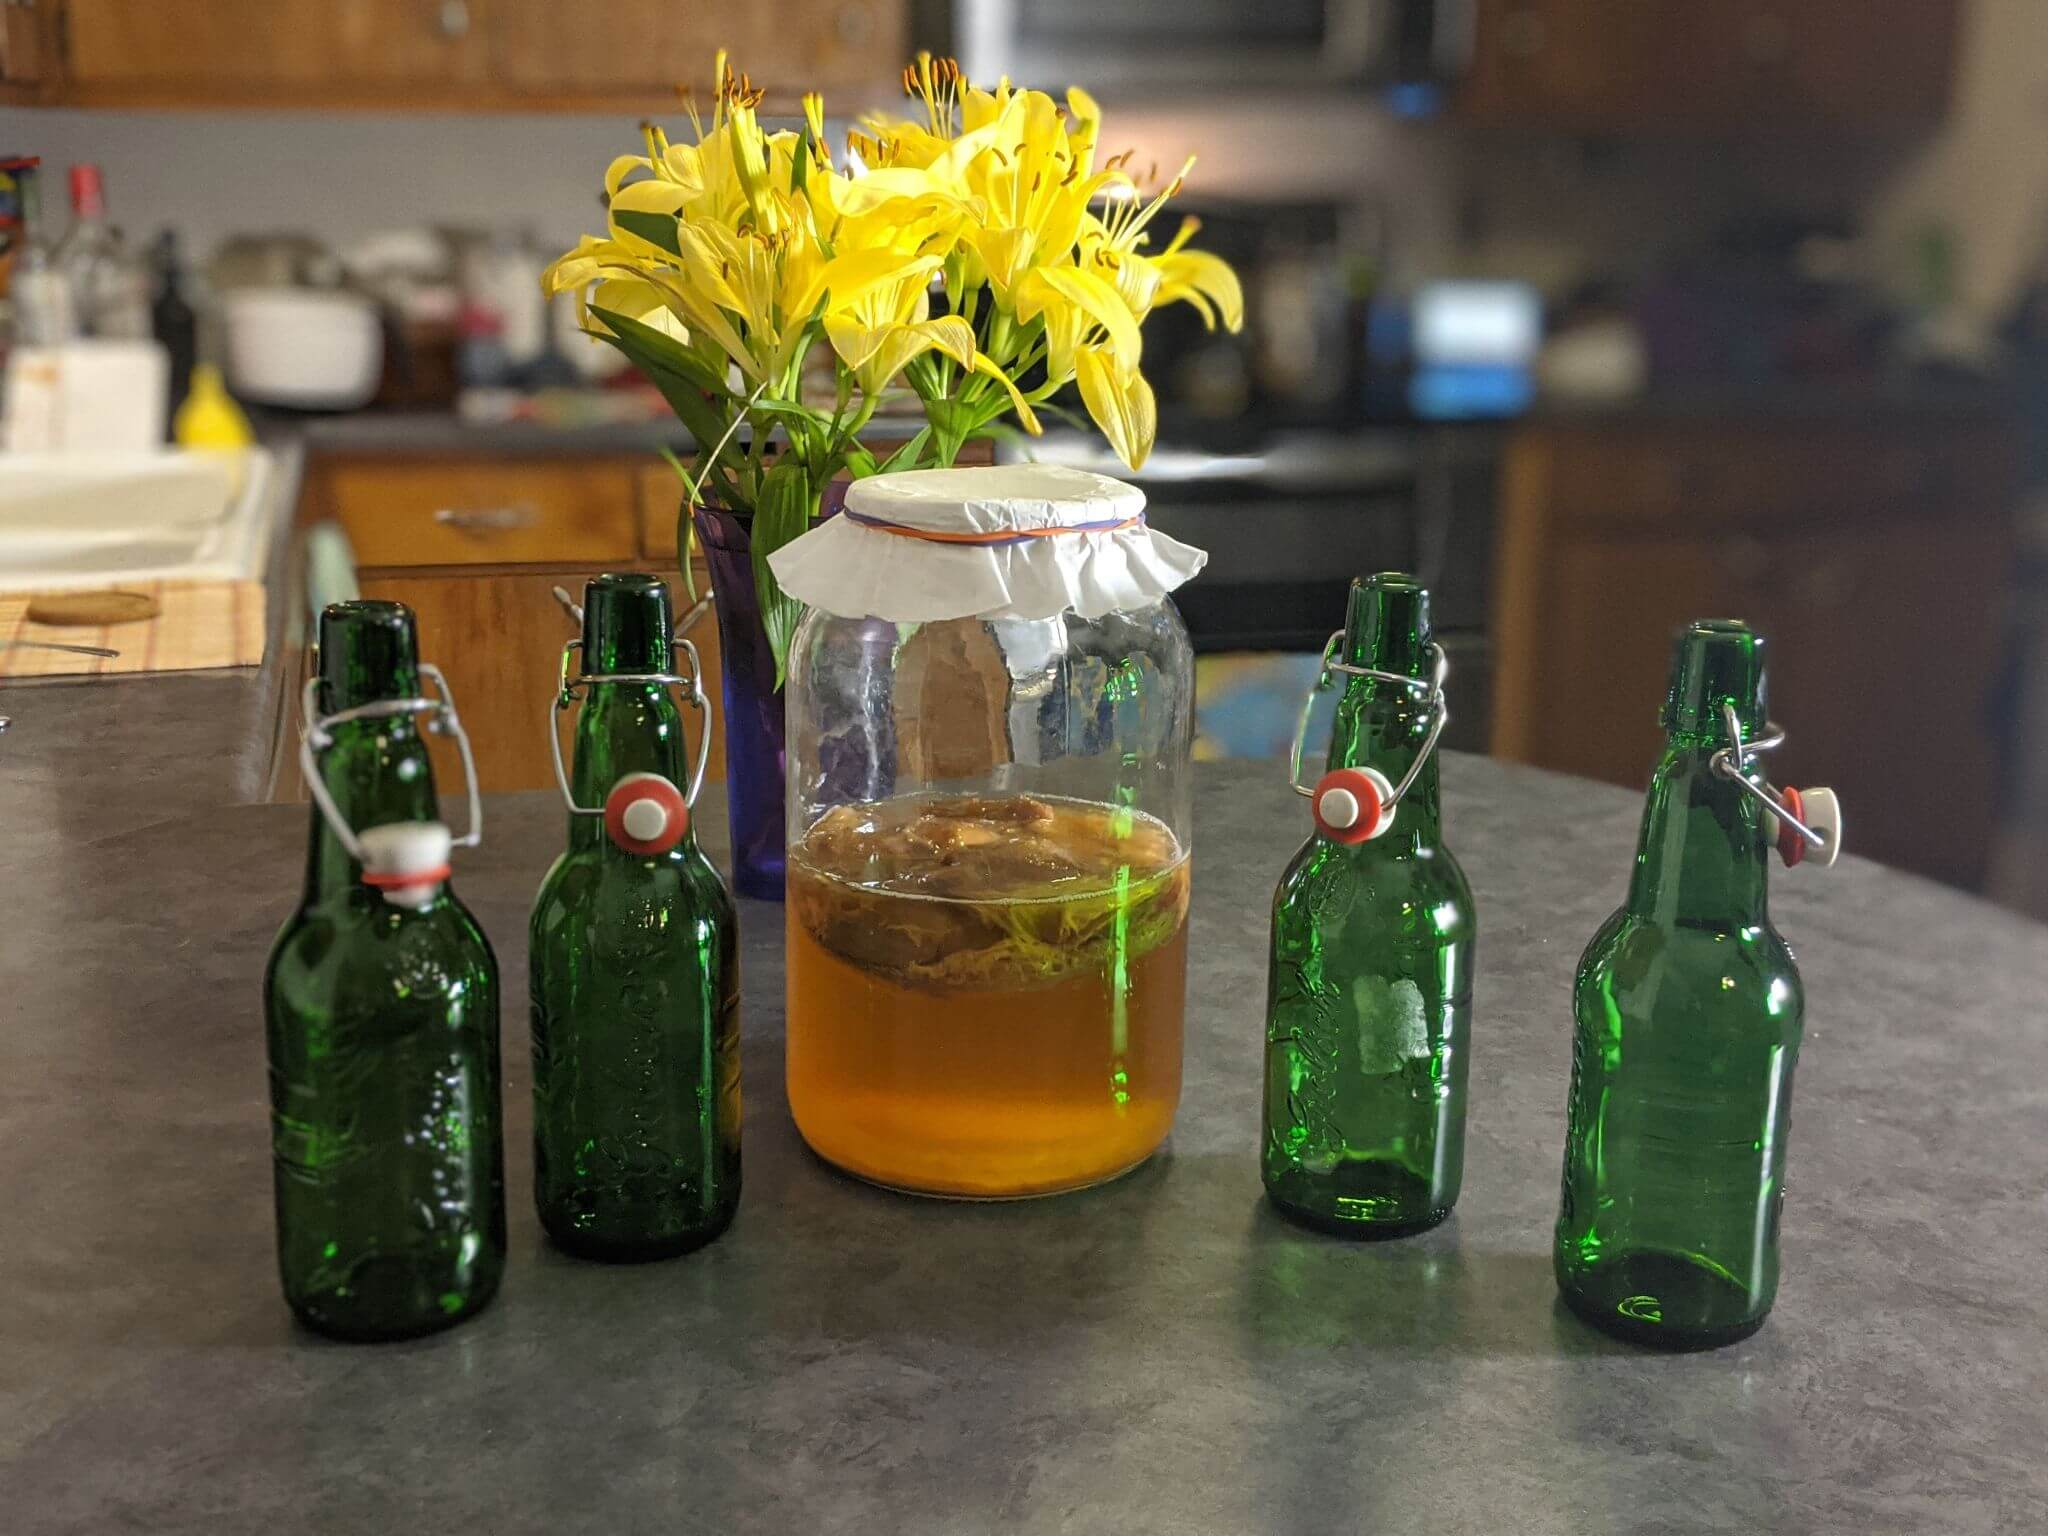 Kombucha and bottles on counter